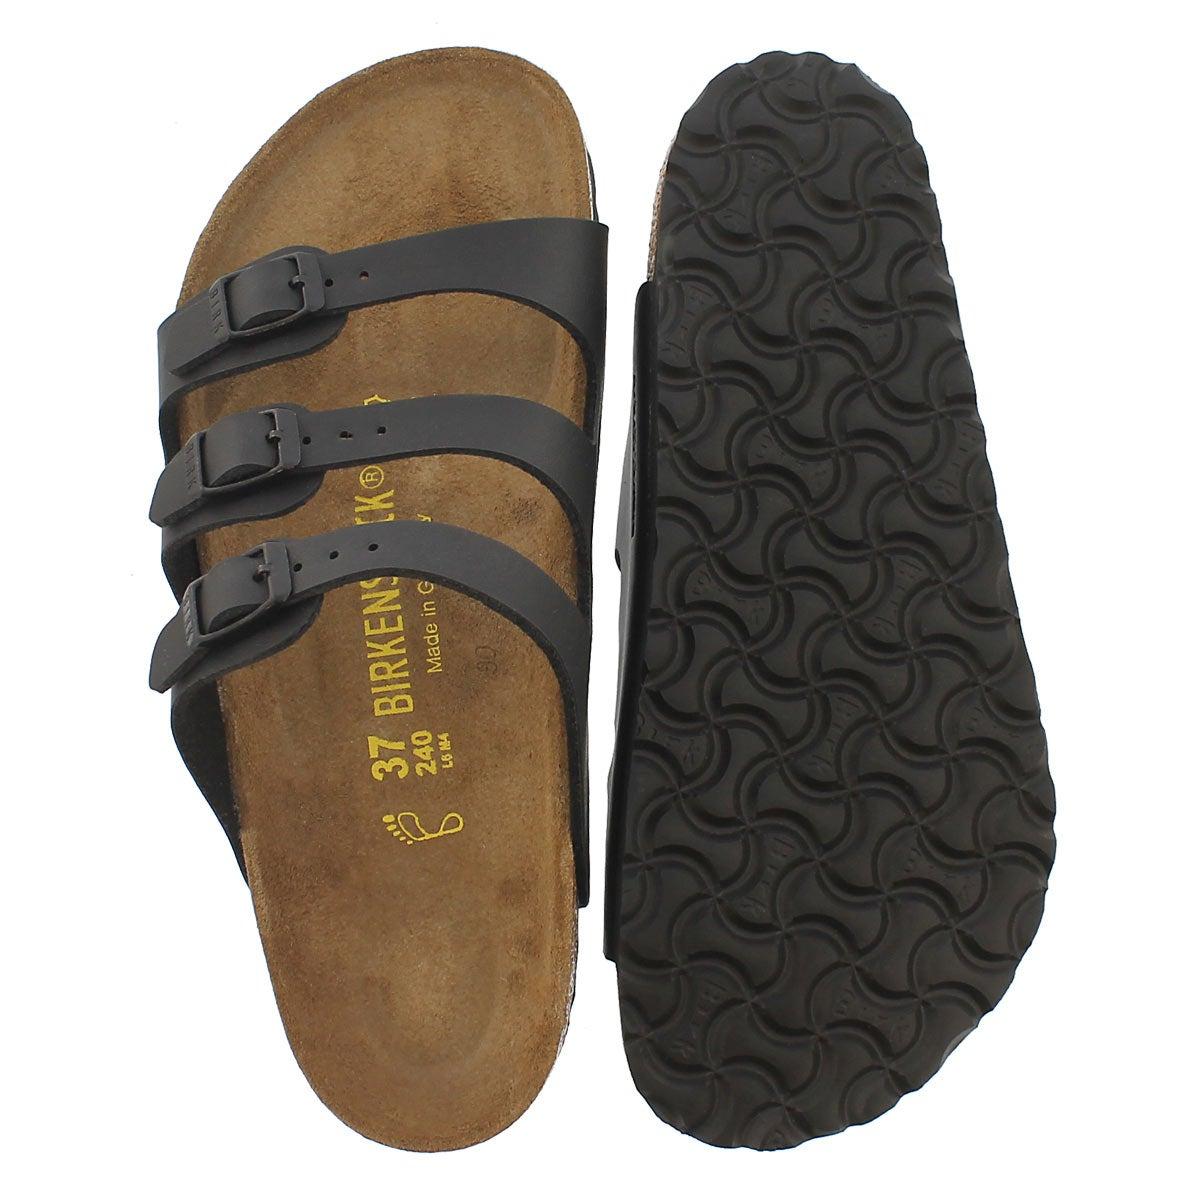 Lds Florida black 3 strap sandal